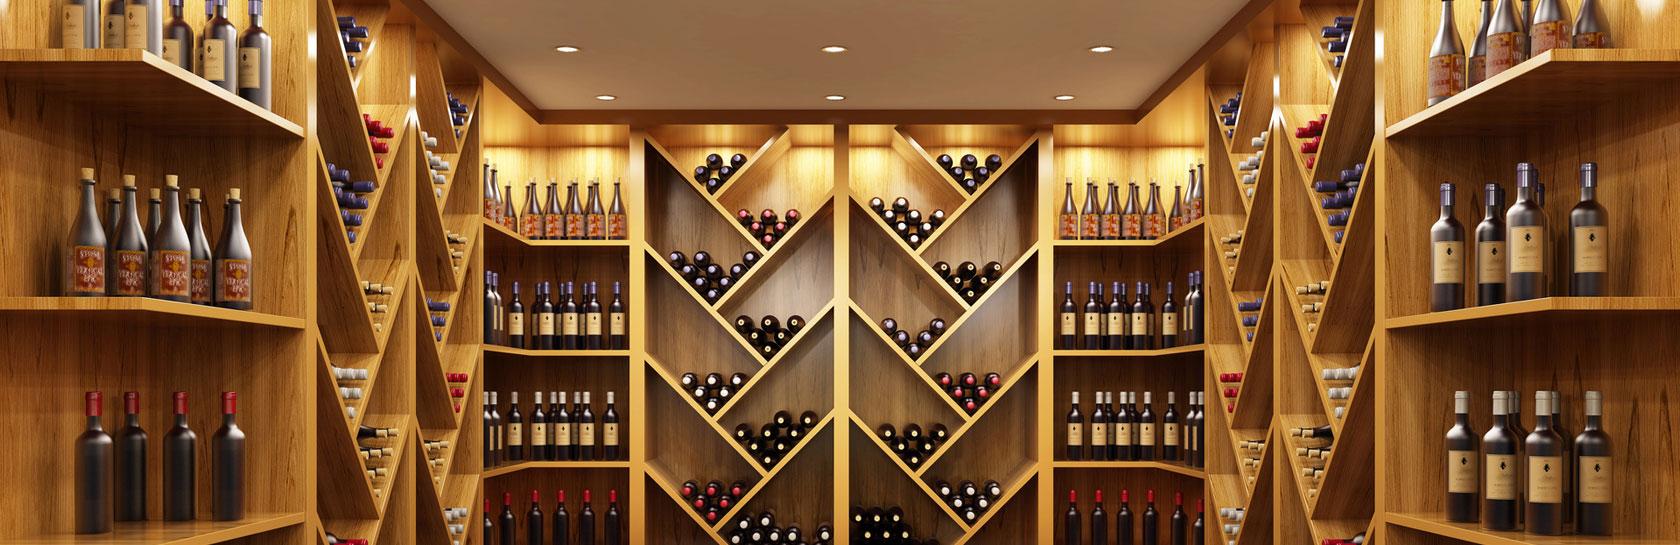 Wine cellar & gallery